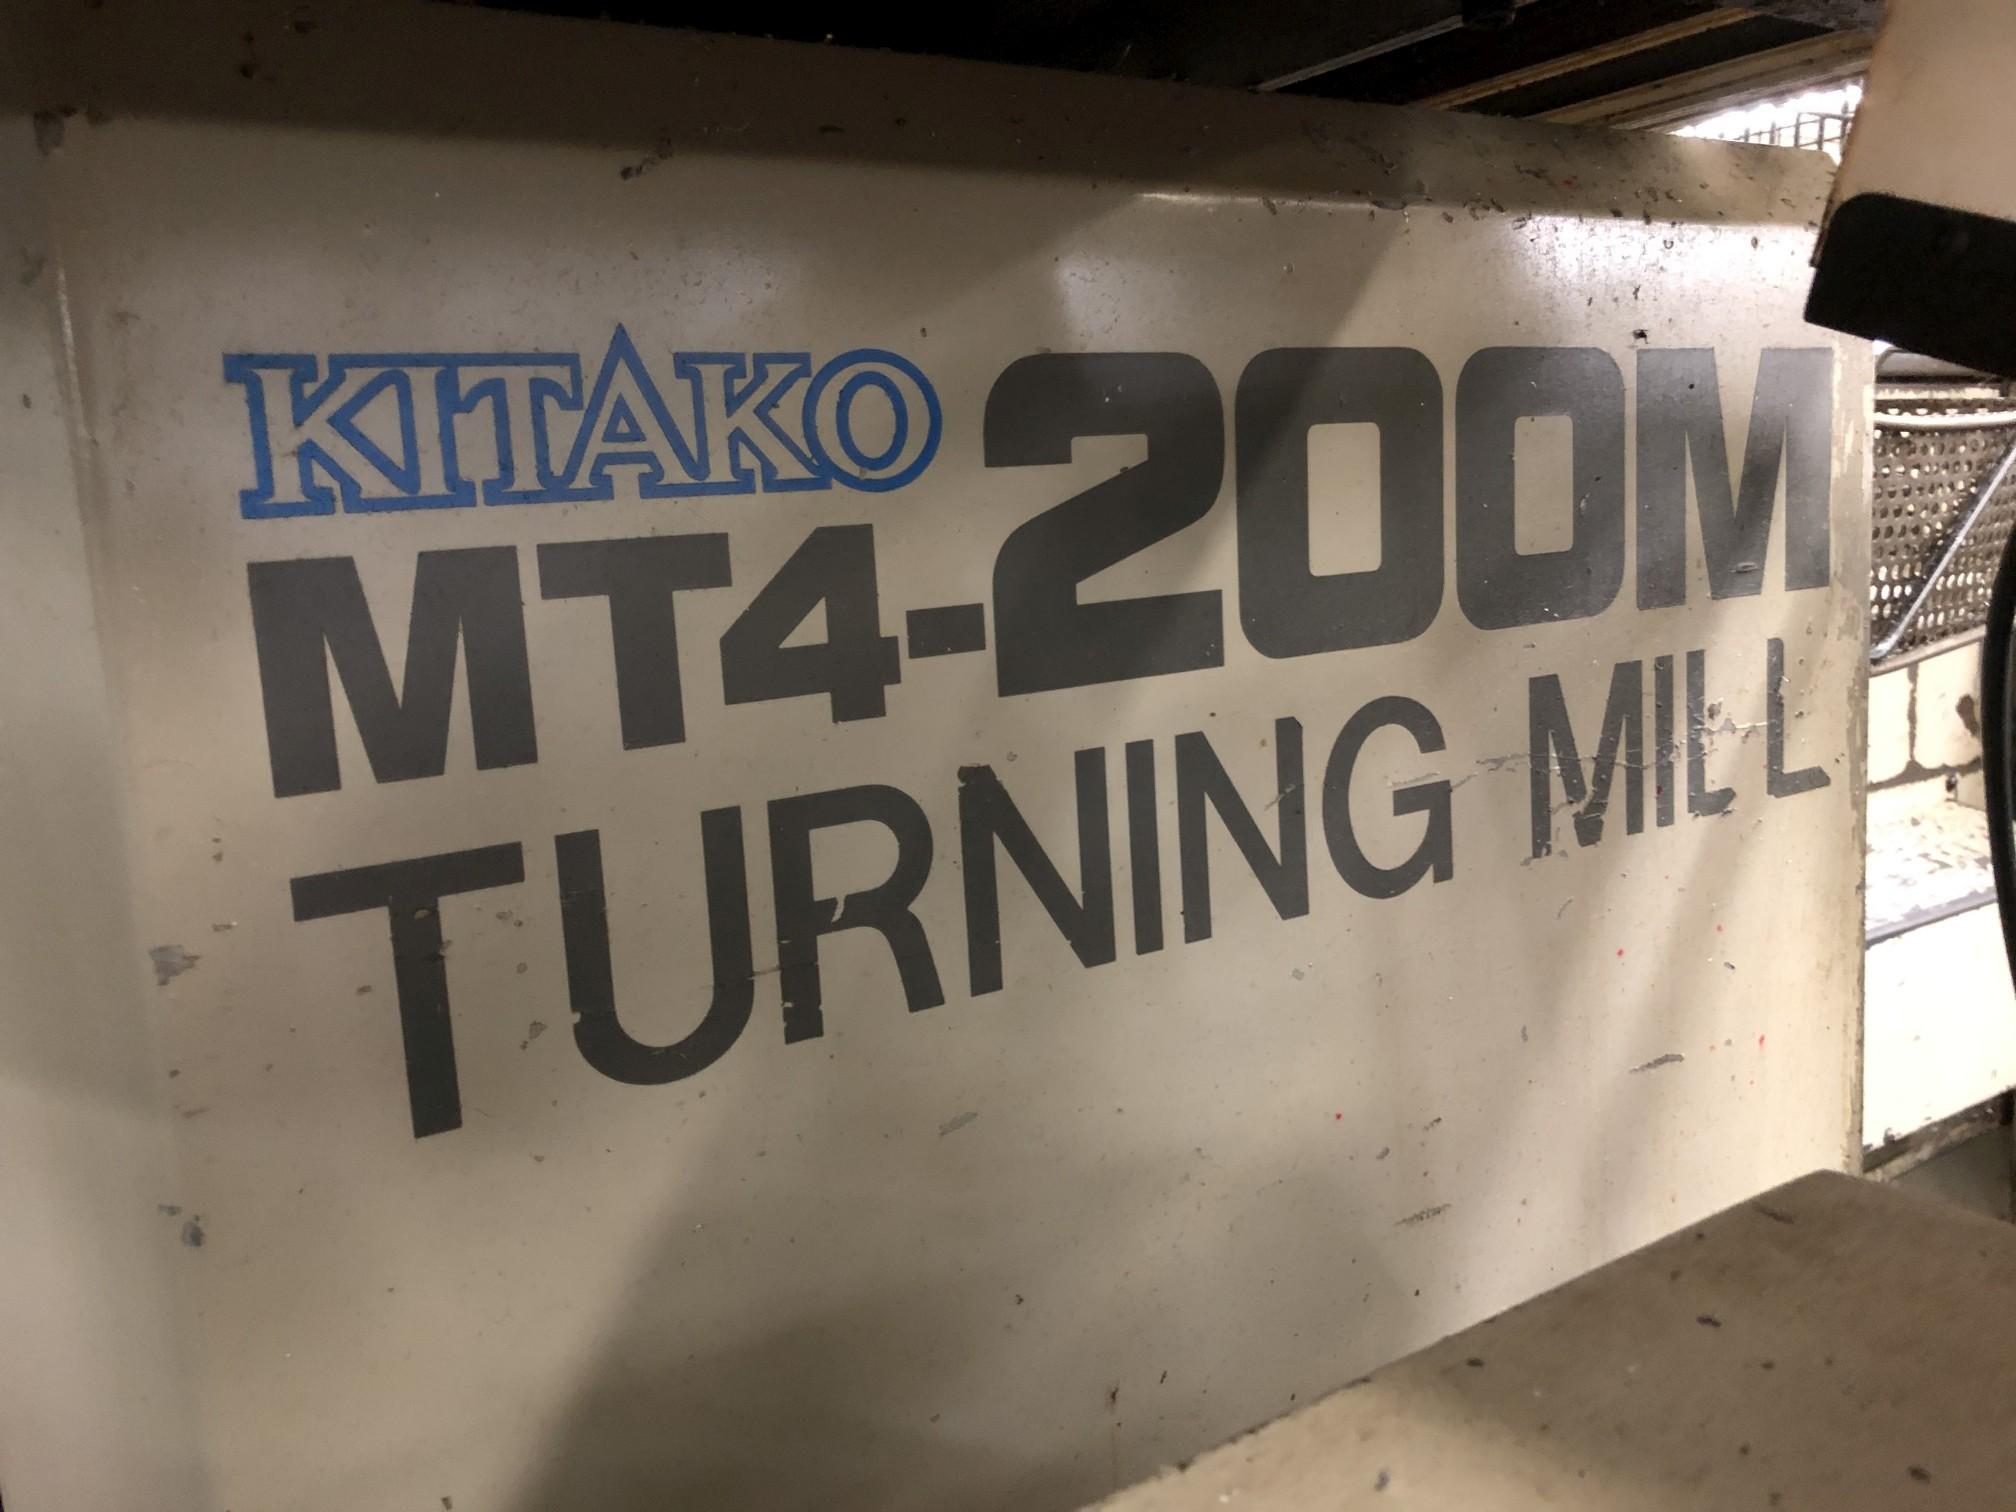 1999 Kitako MT4-200M Multi-Spindle CNC Turning Mill - Image 14 of 15